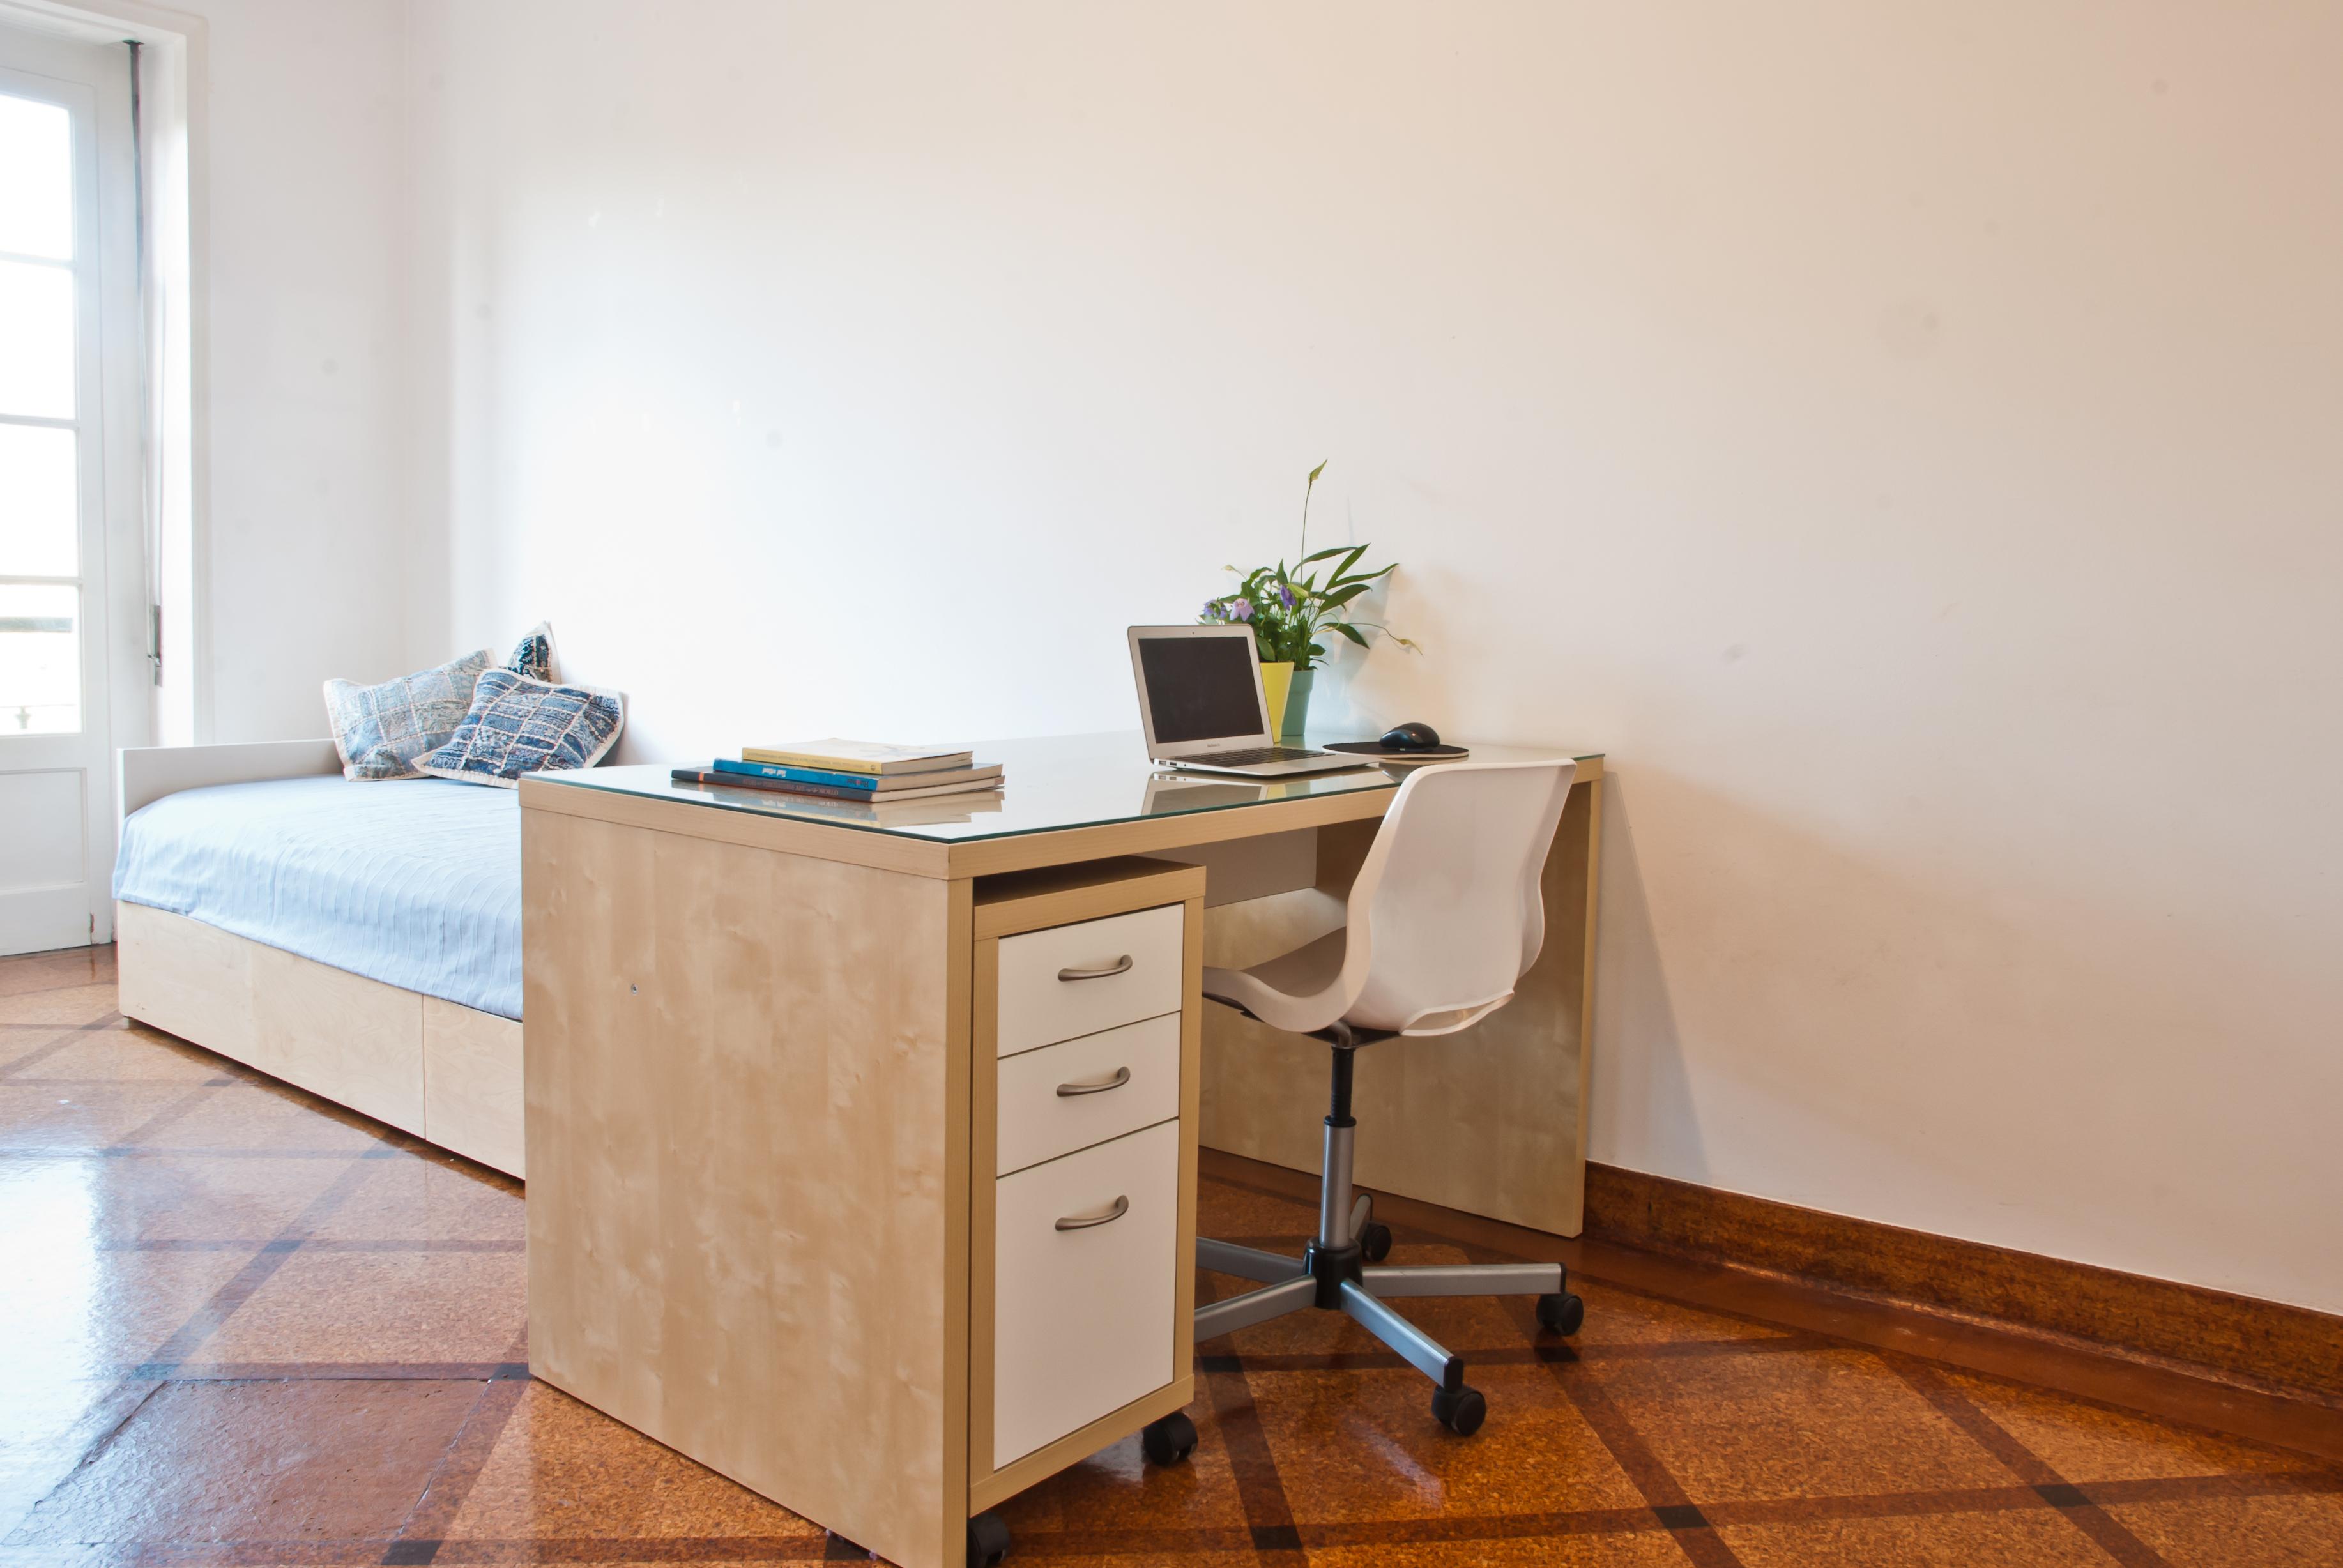 AL_-_Quarto.Room_nº1_-_Foto_1.jpg